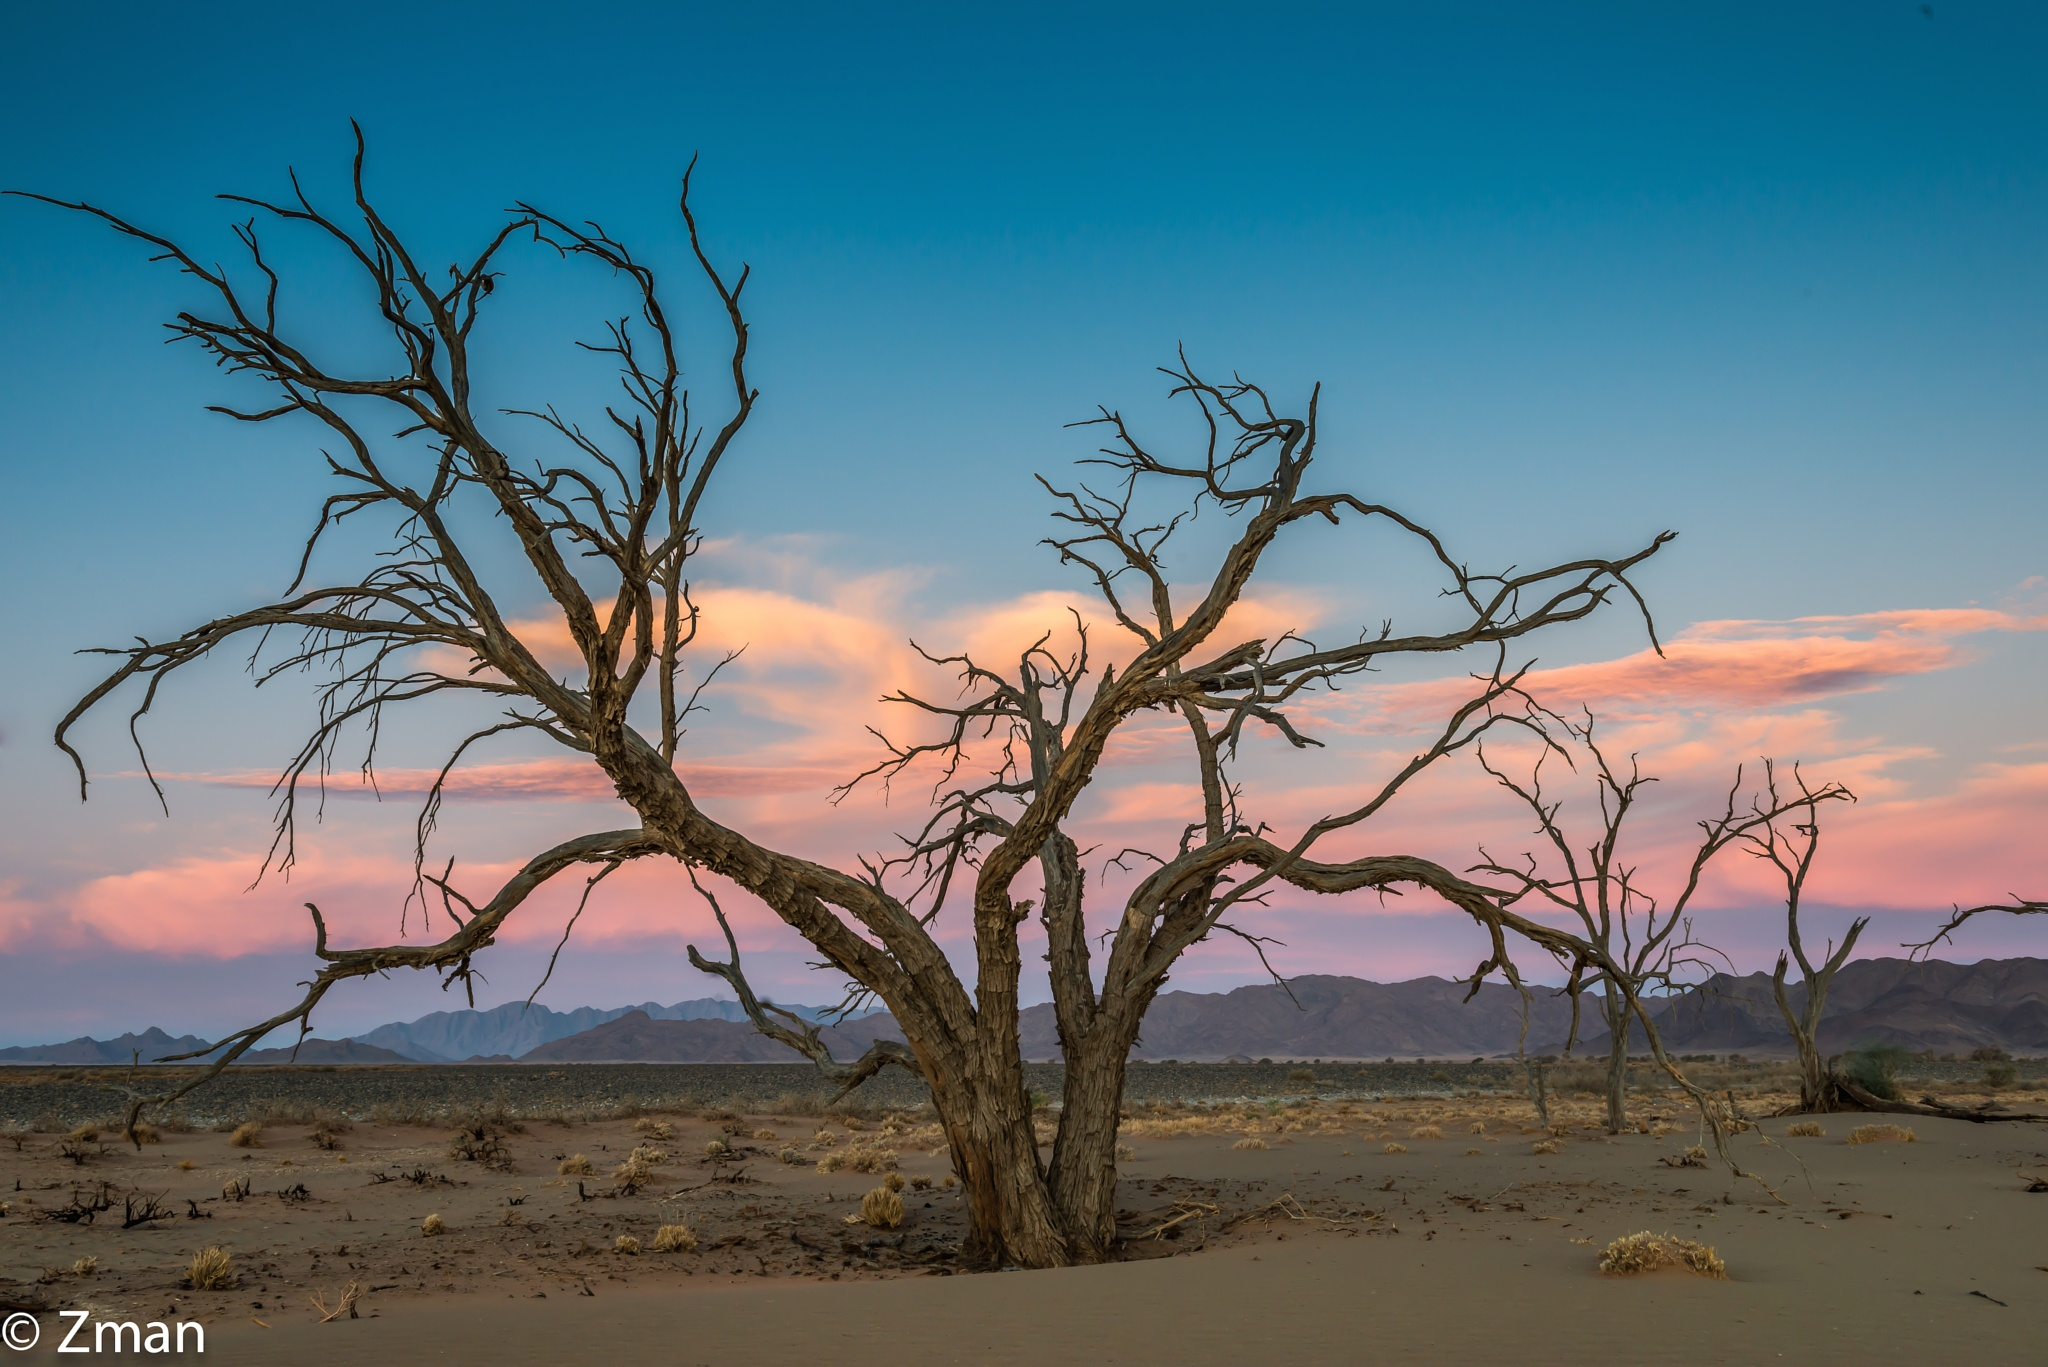 Acacia Trees at Sunset 01 by muhammad.nasser.963